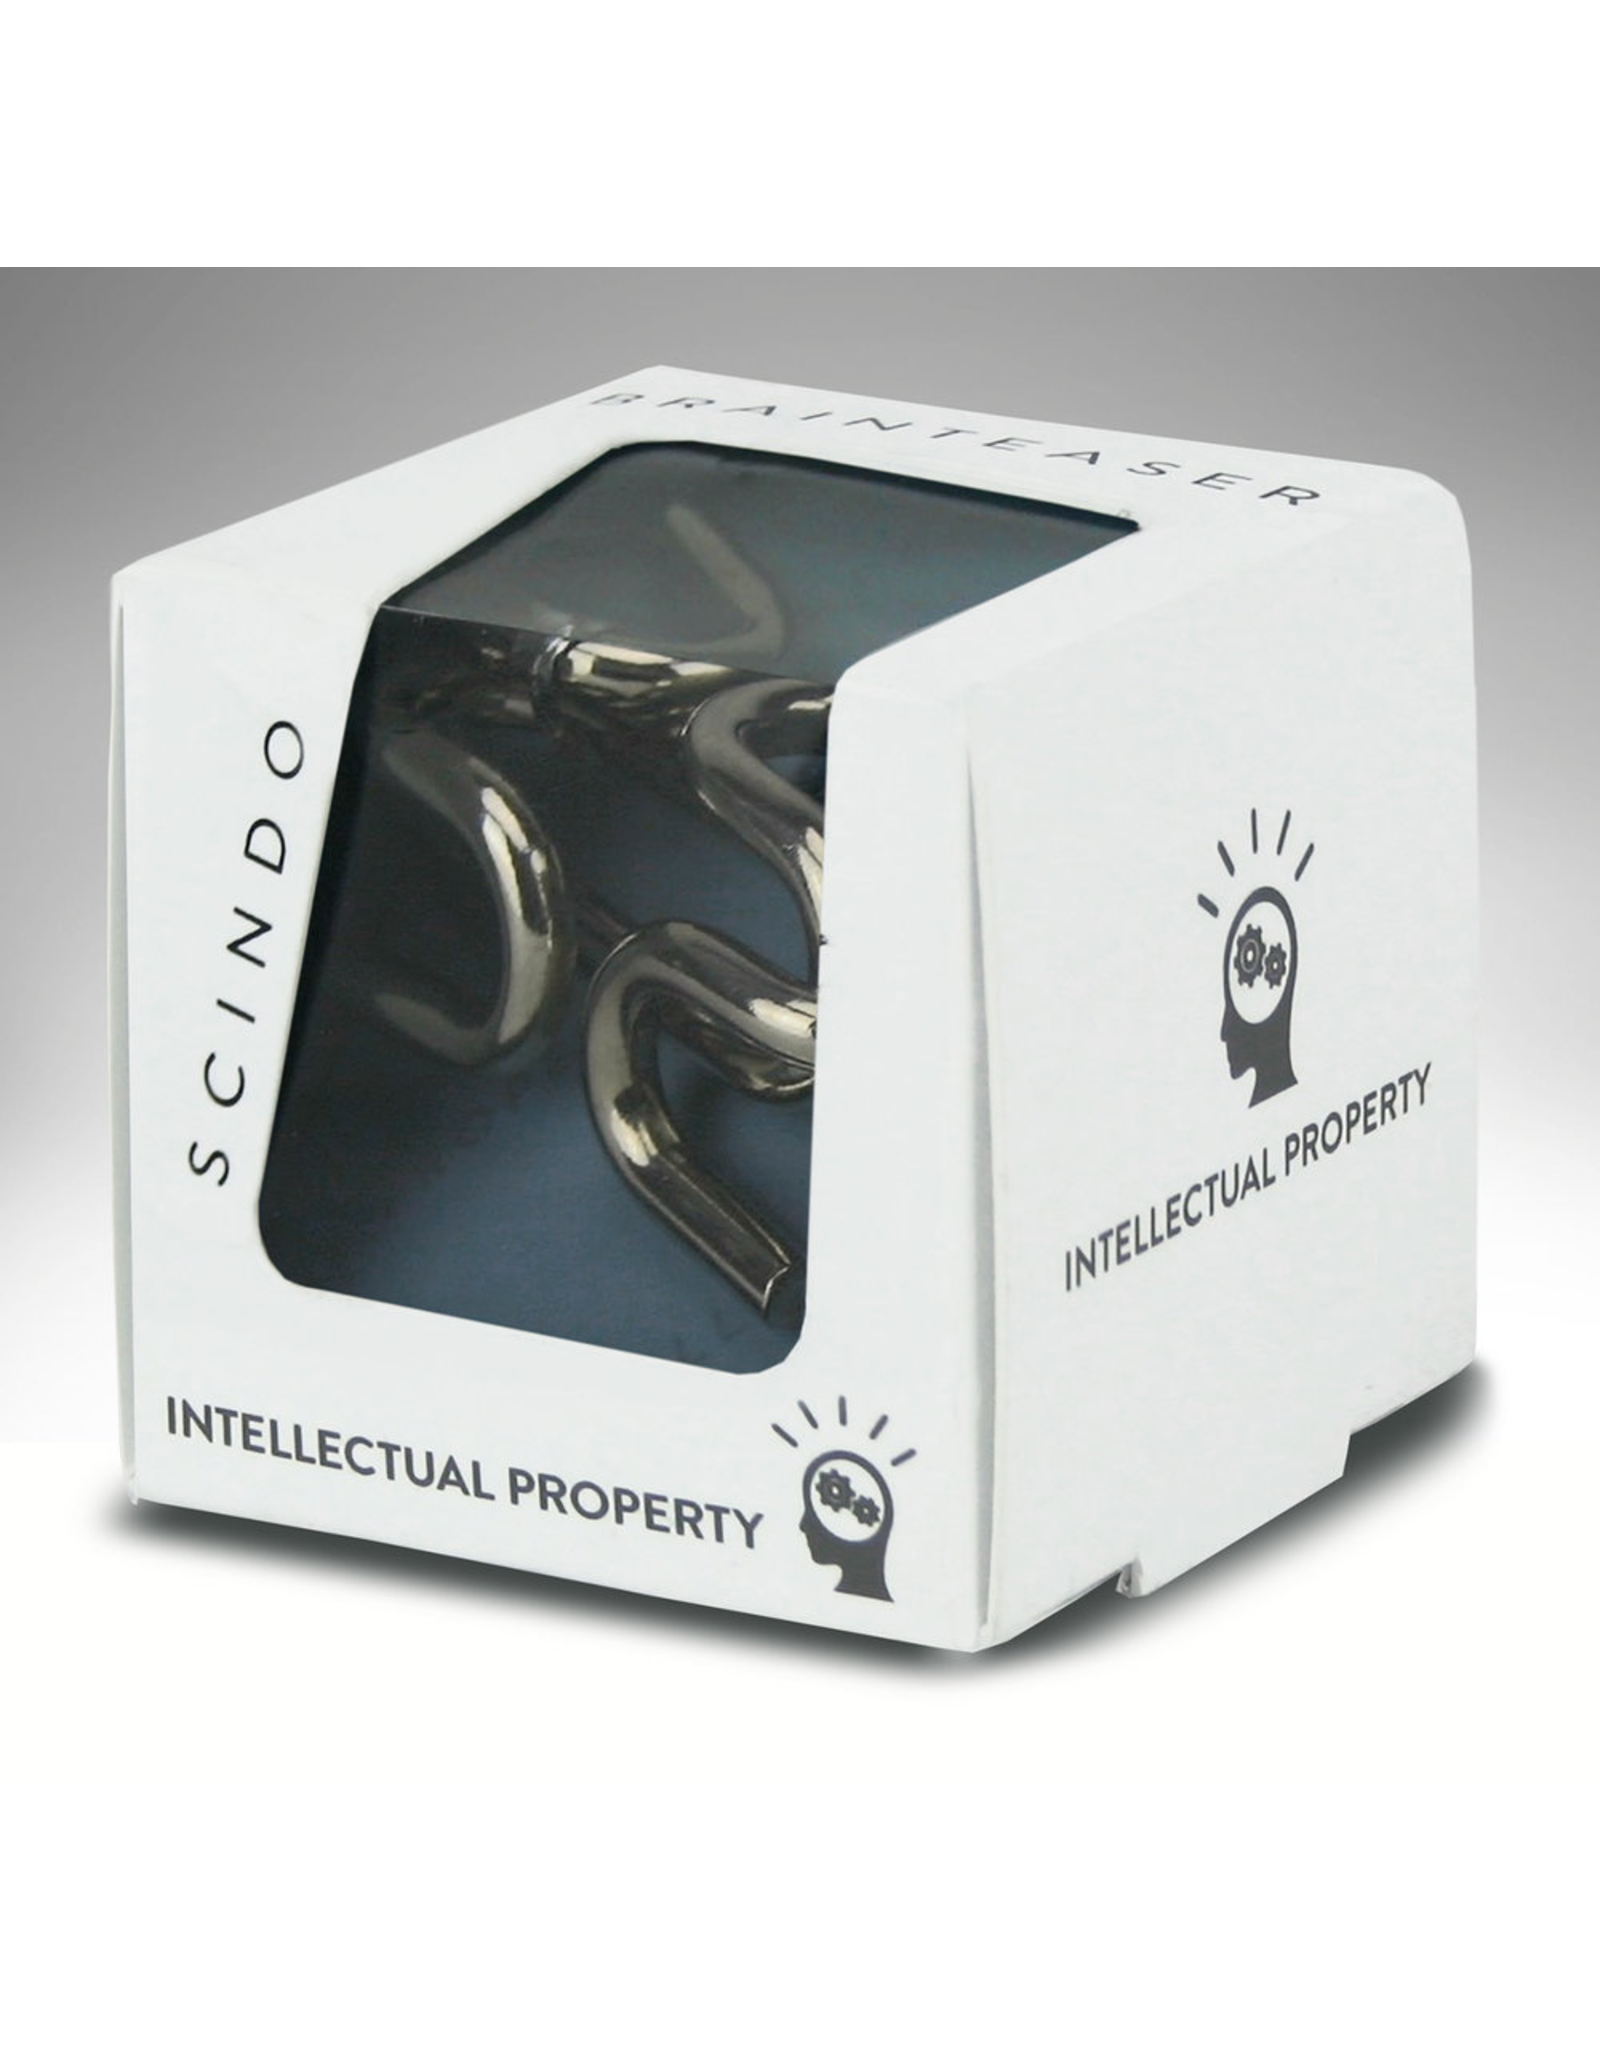 Project Genius Intellectual Property Puzzle: Scindo